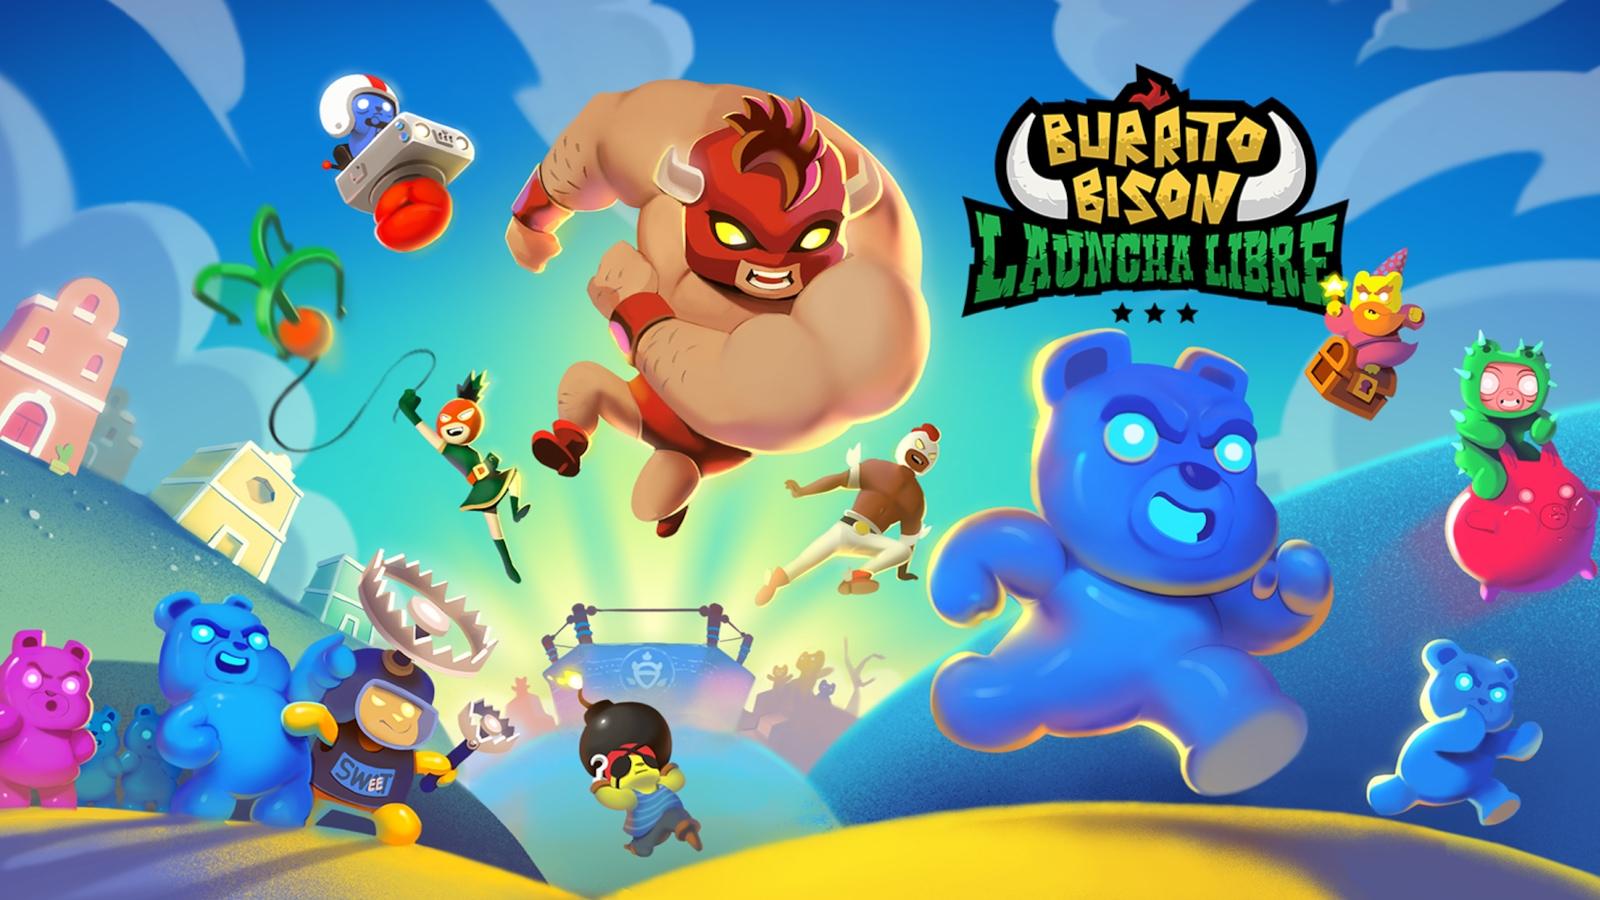 Image titre du jeu Burrito Bison Launcha Libre de Juicy Beast.